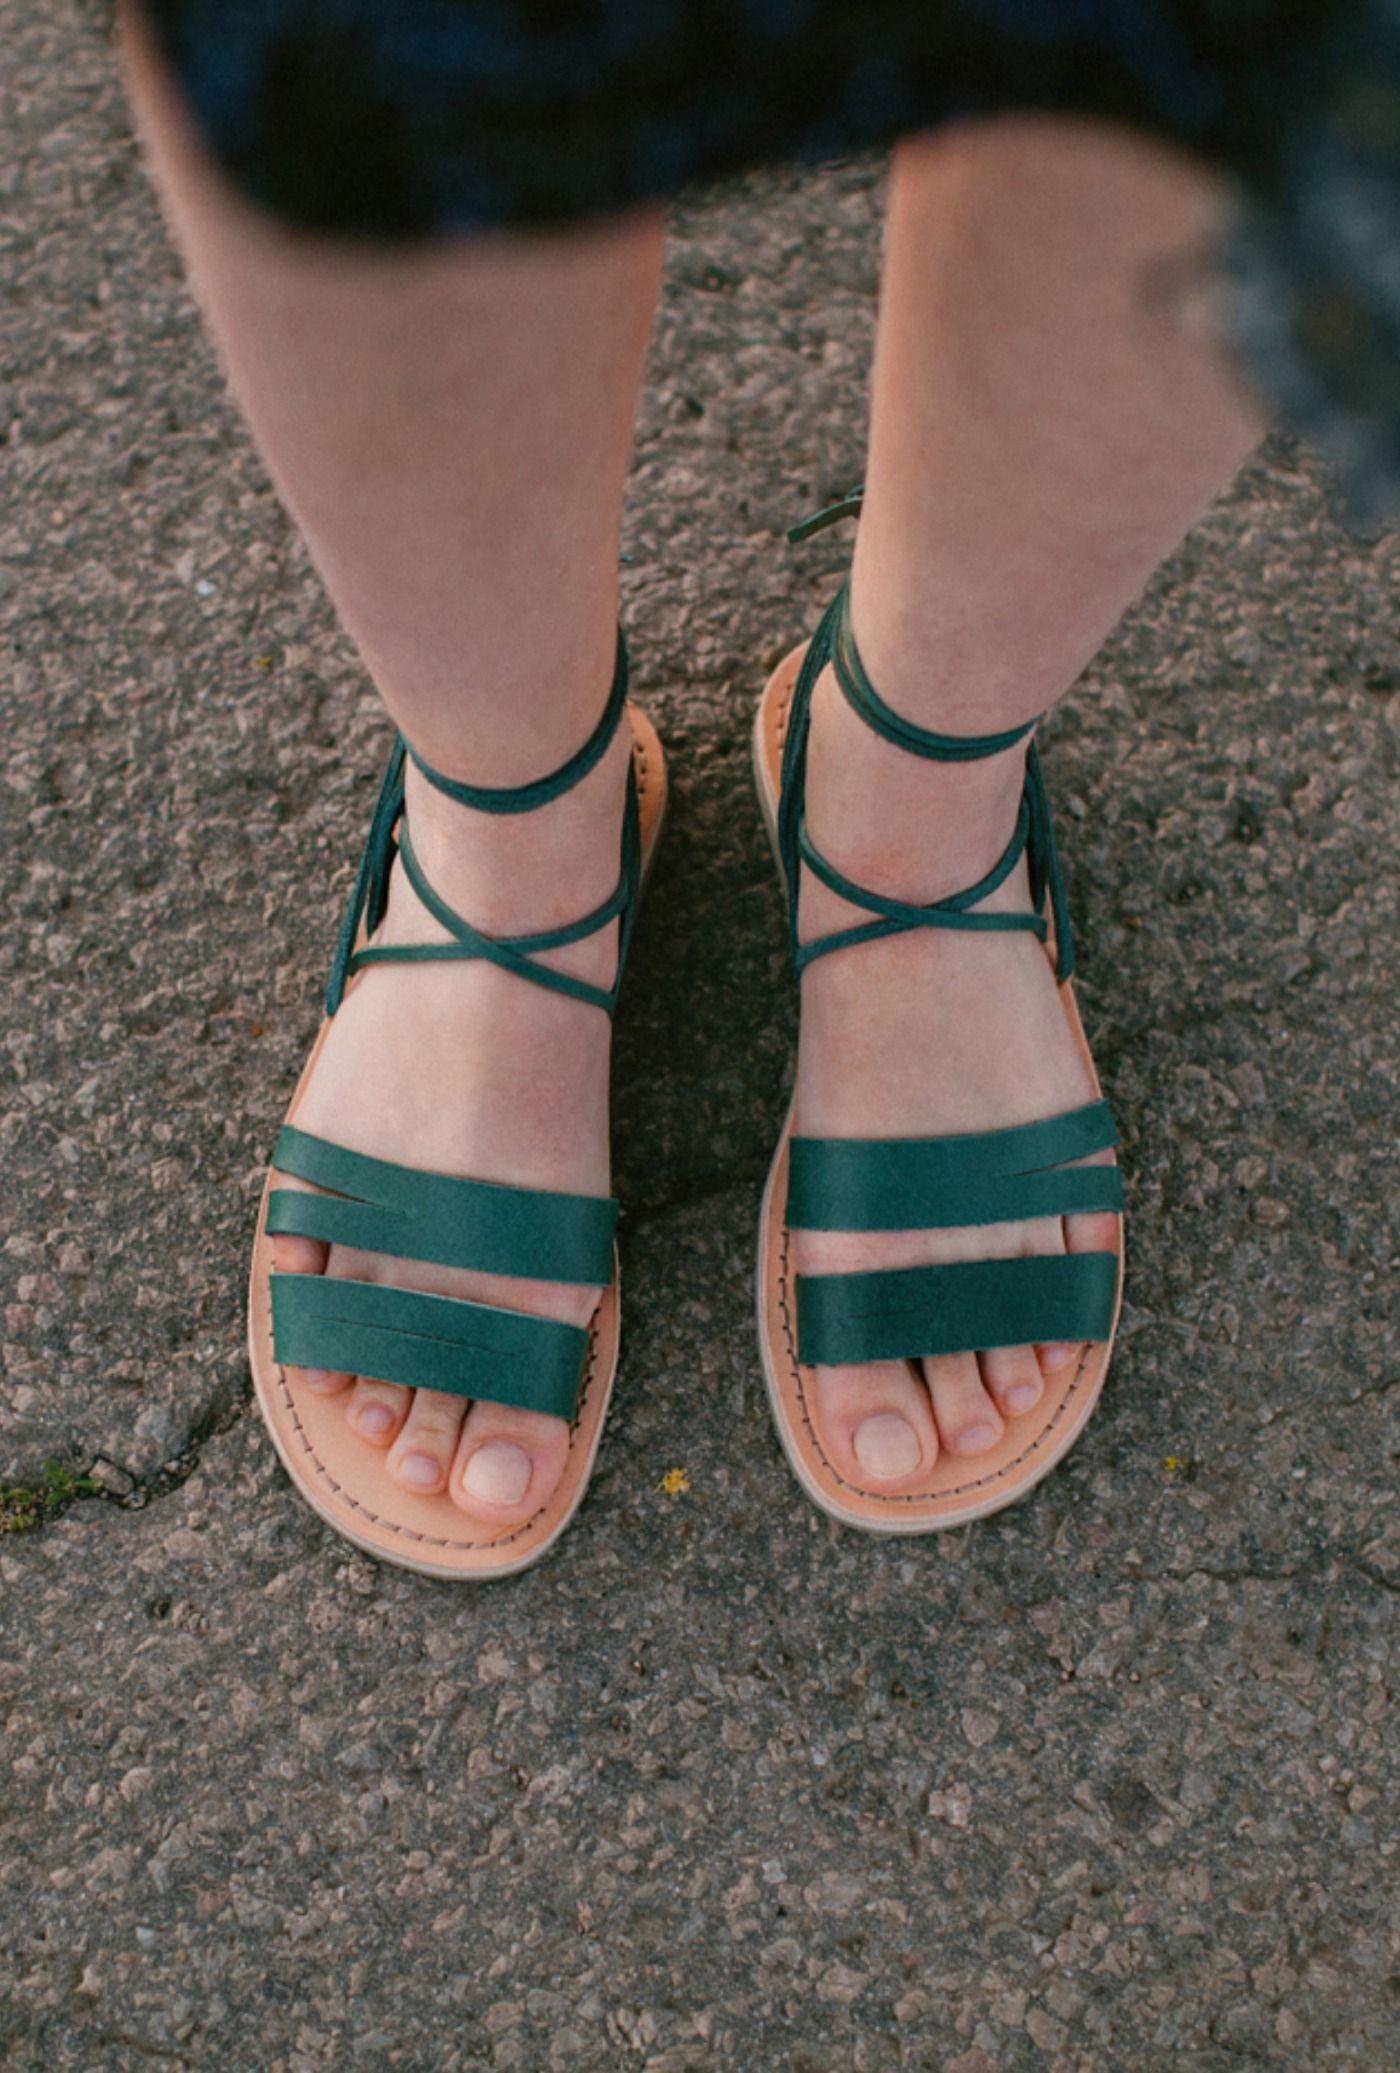 Positano Wrap Sandals   Wrap sandals, Gladiator sandals